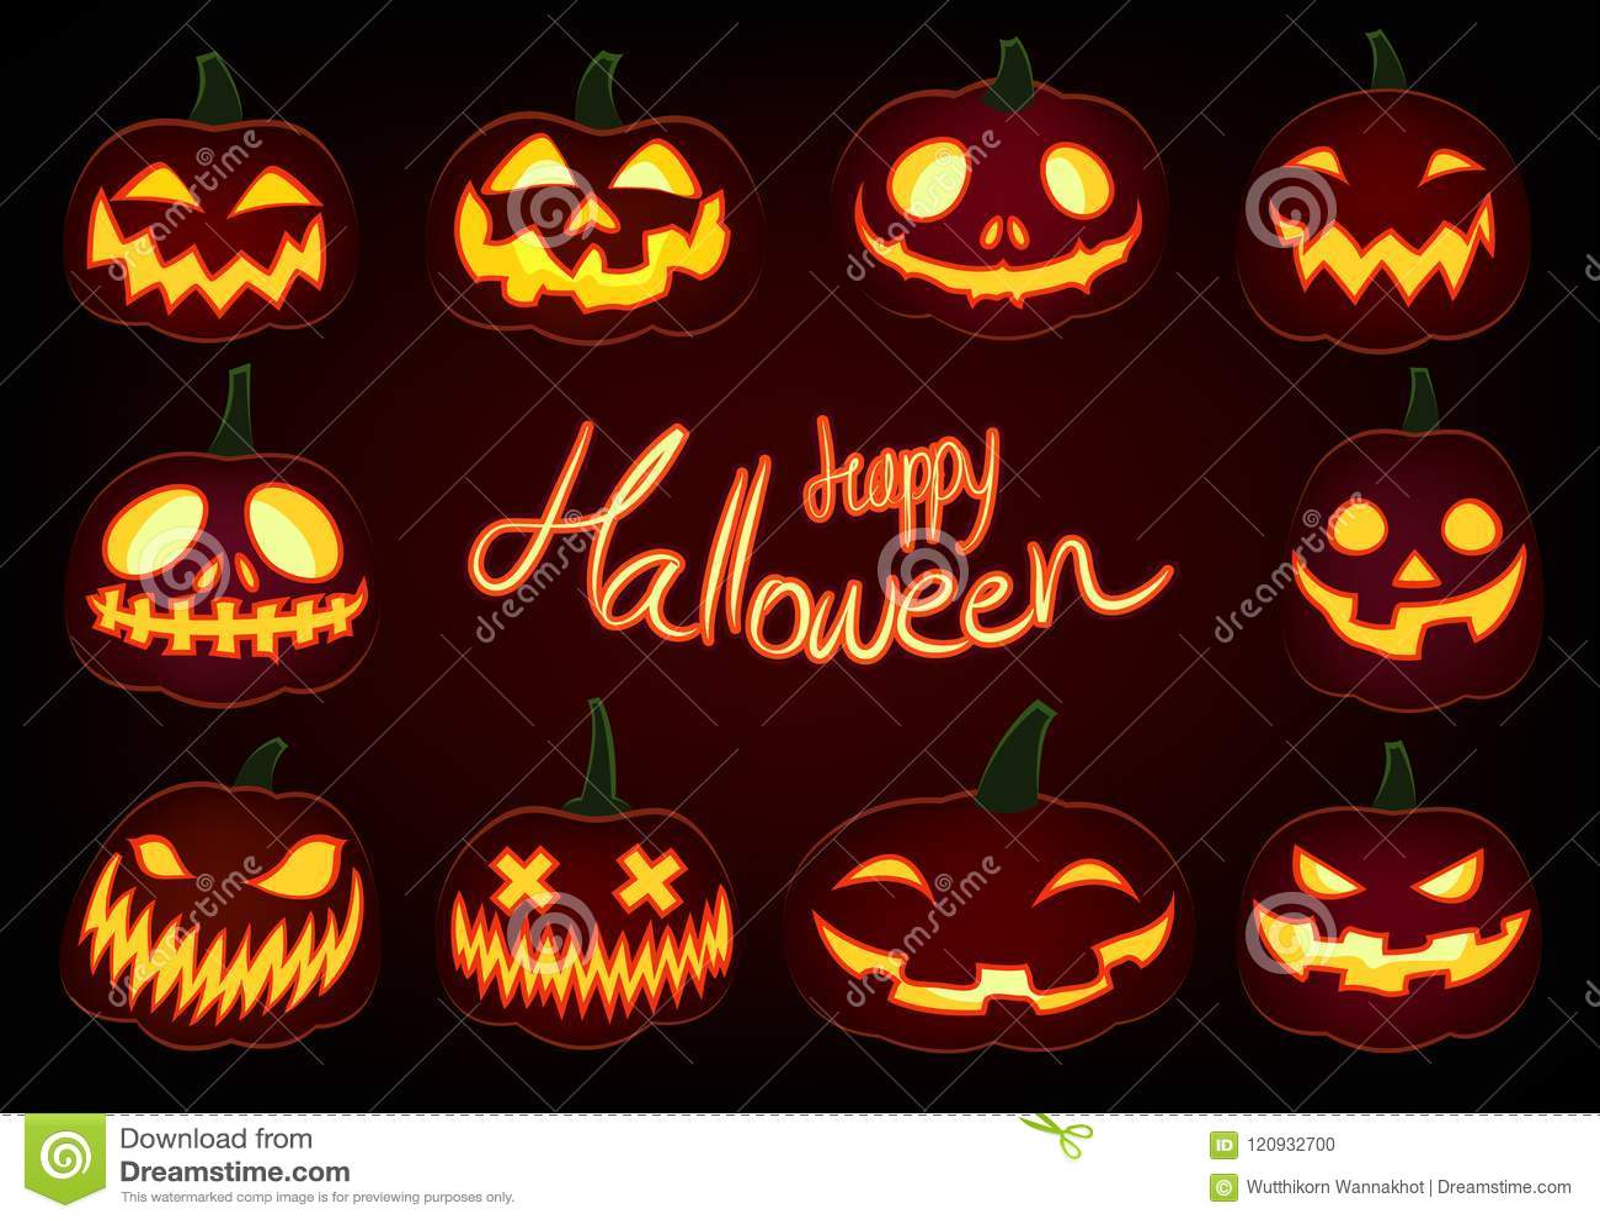 Happy Halloween Pumpkin Glow Jack O Lantern Set On Dark Background Stock Vector Illustration Of Pumpkin Lantern 120932700